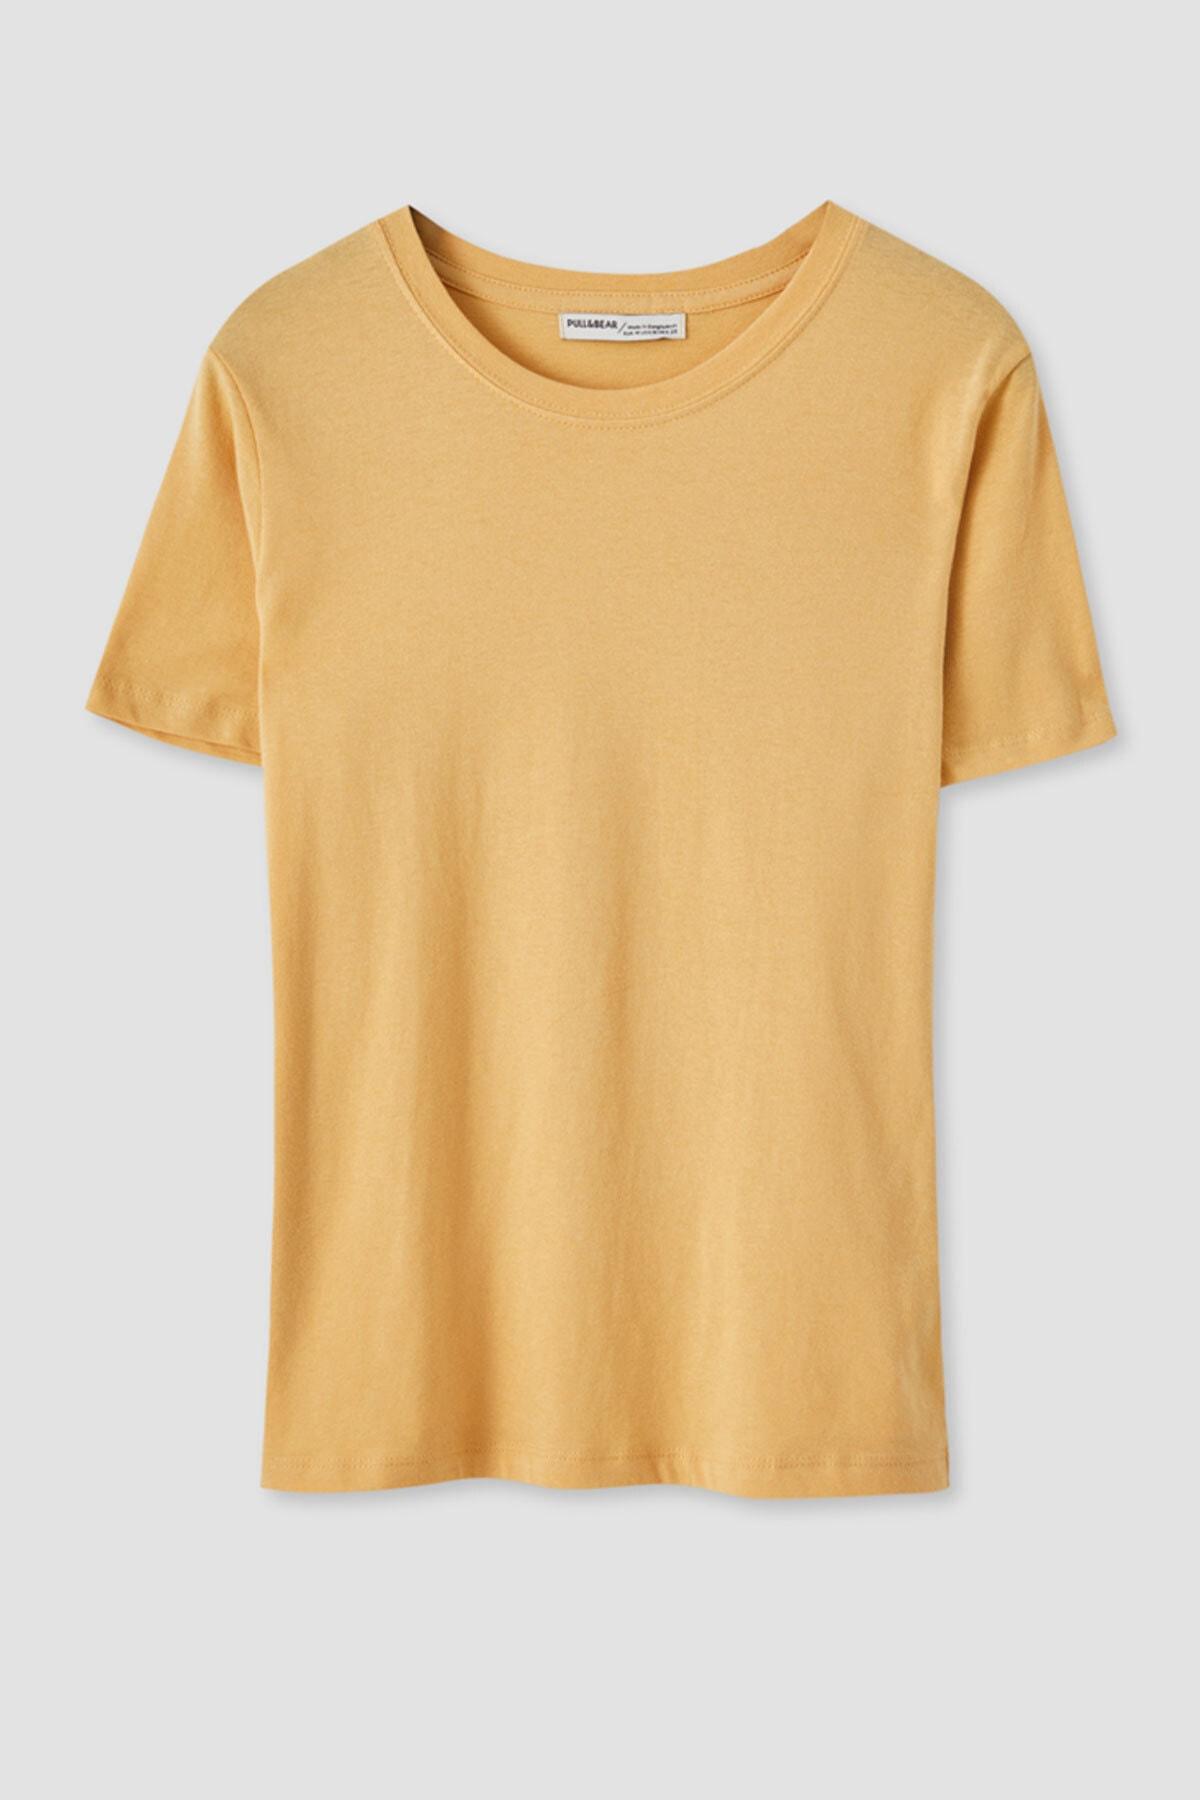 Pull & Bear Kadın Kısa Kollu Basic T-Shirt 05244357 1